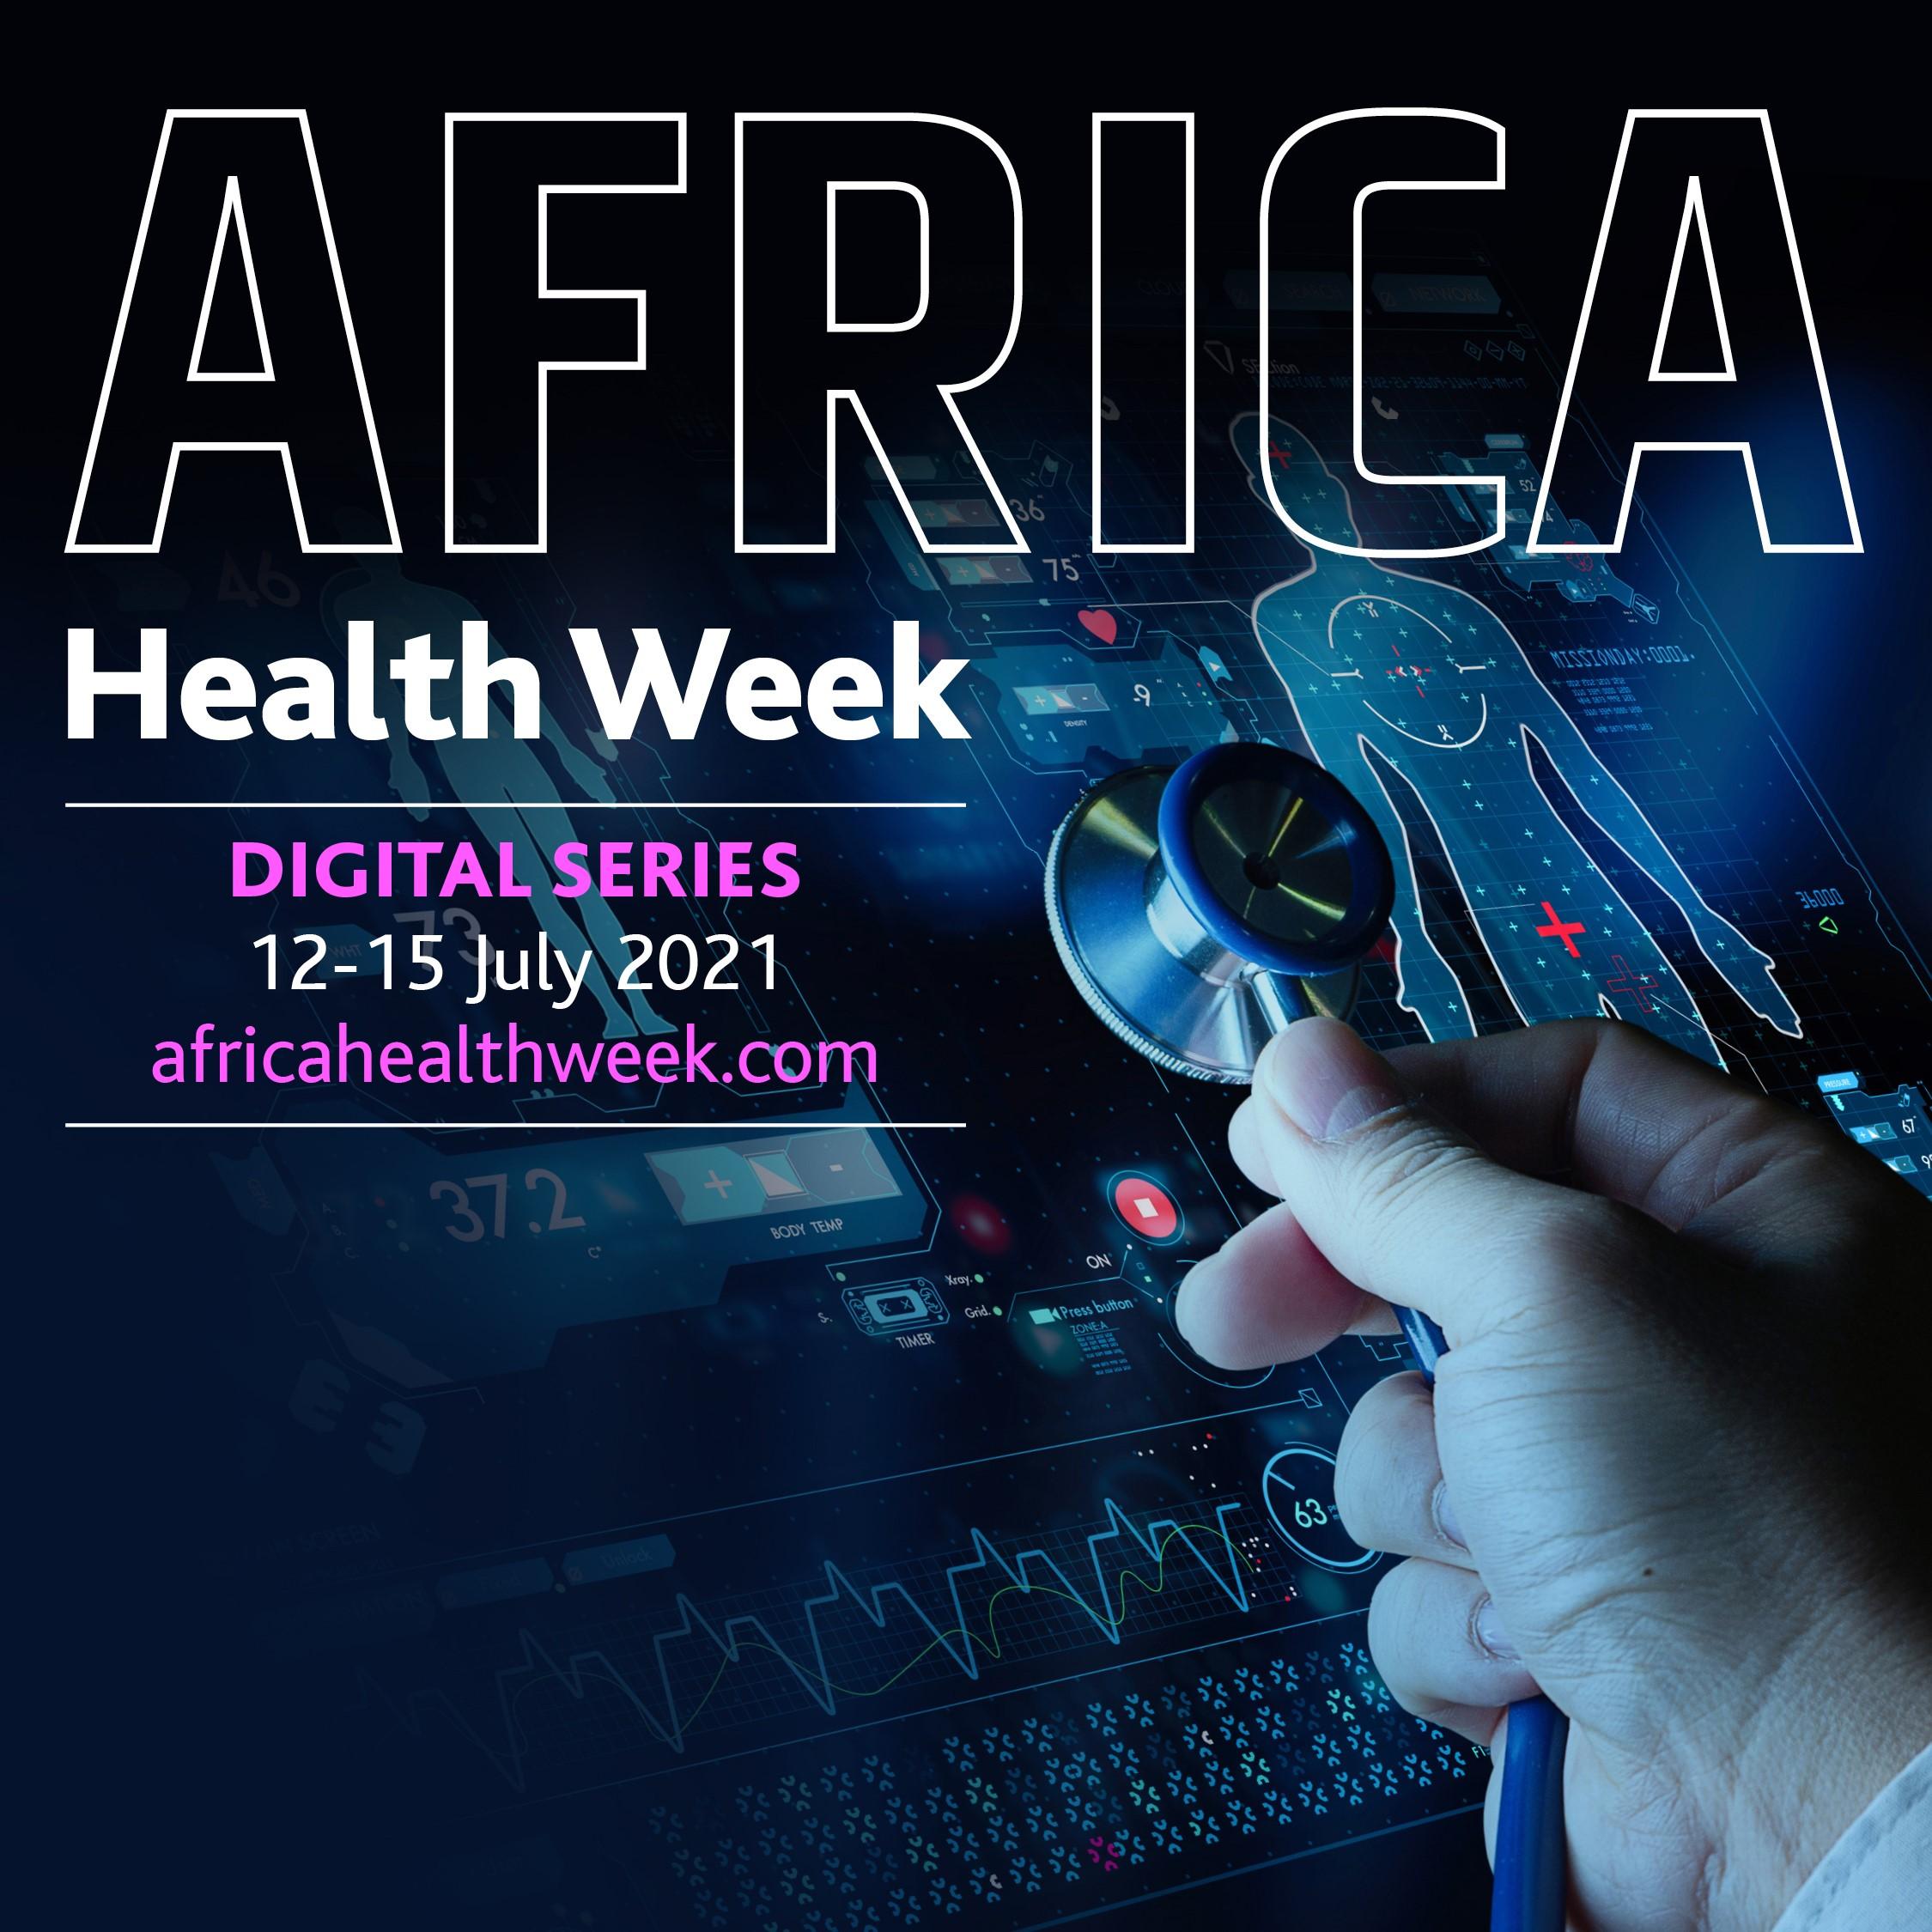 Africa Health week